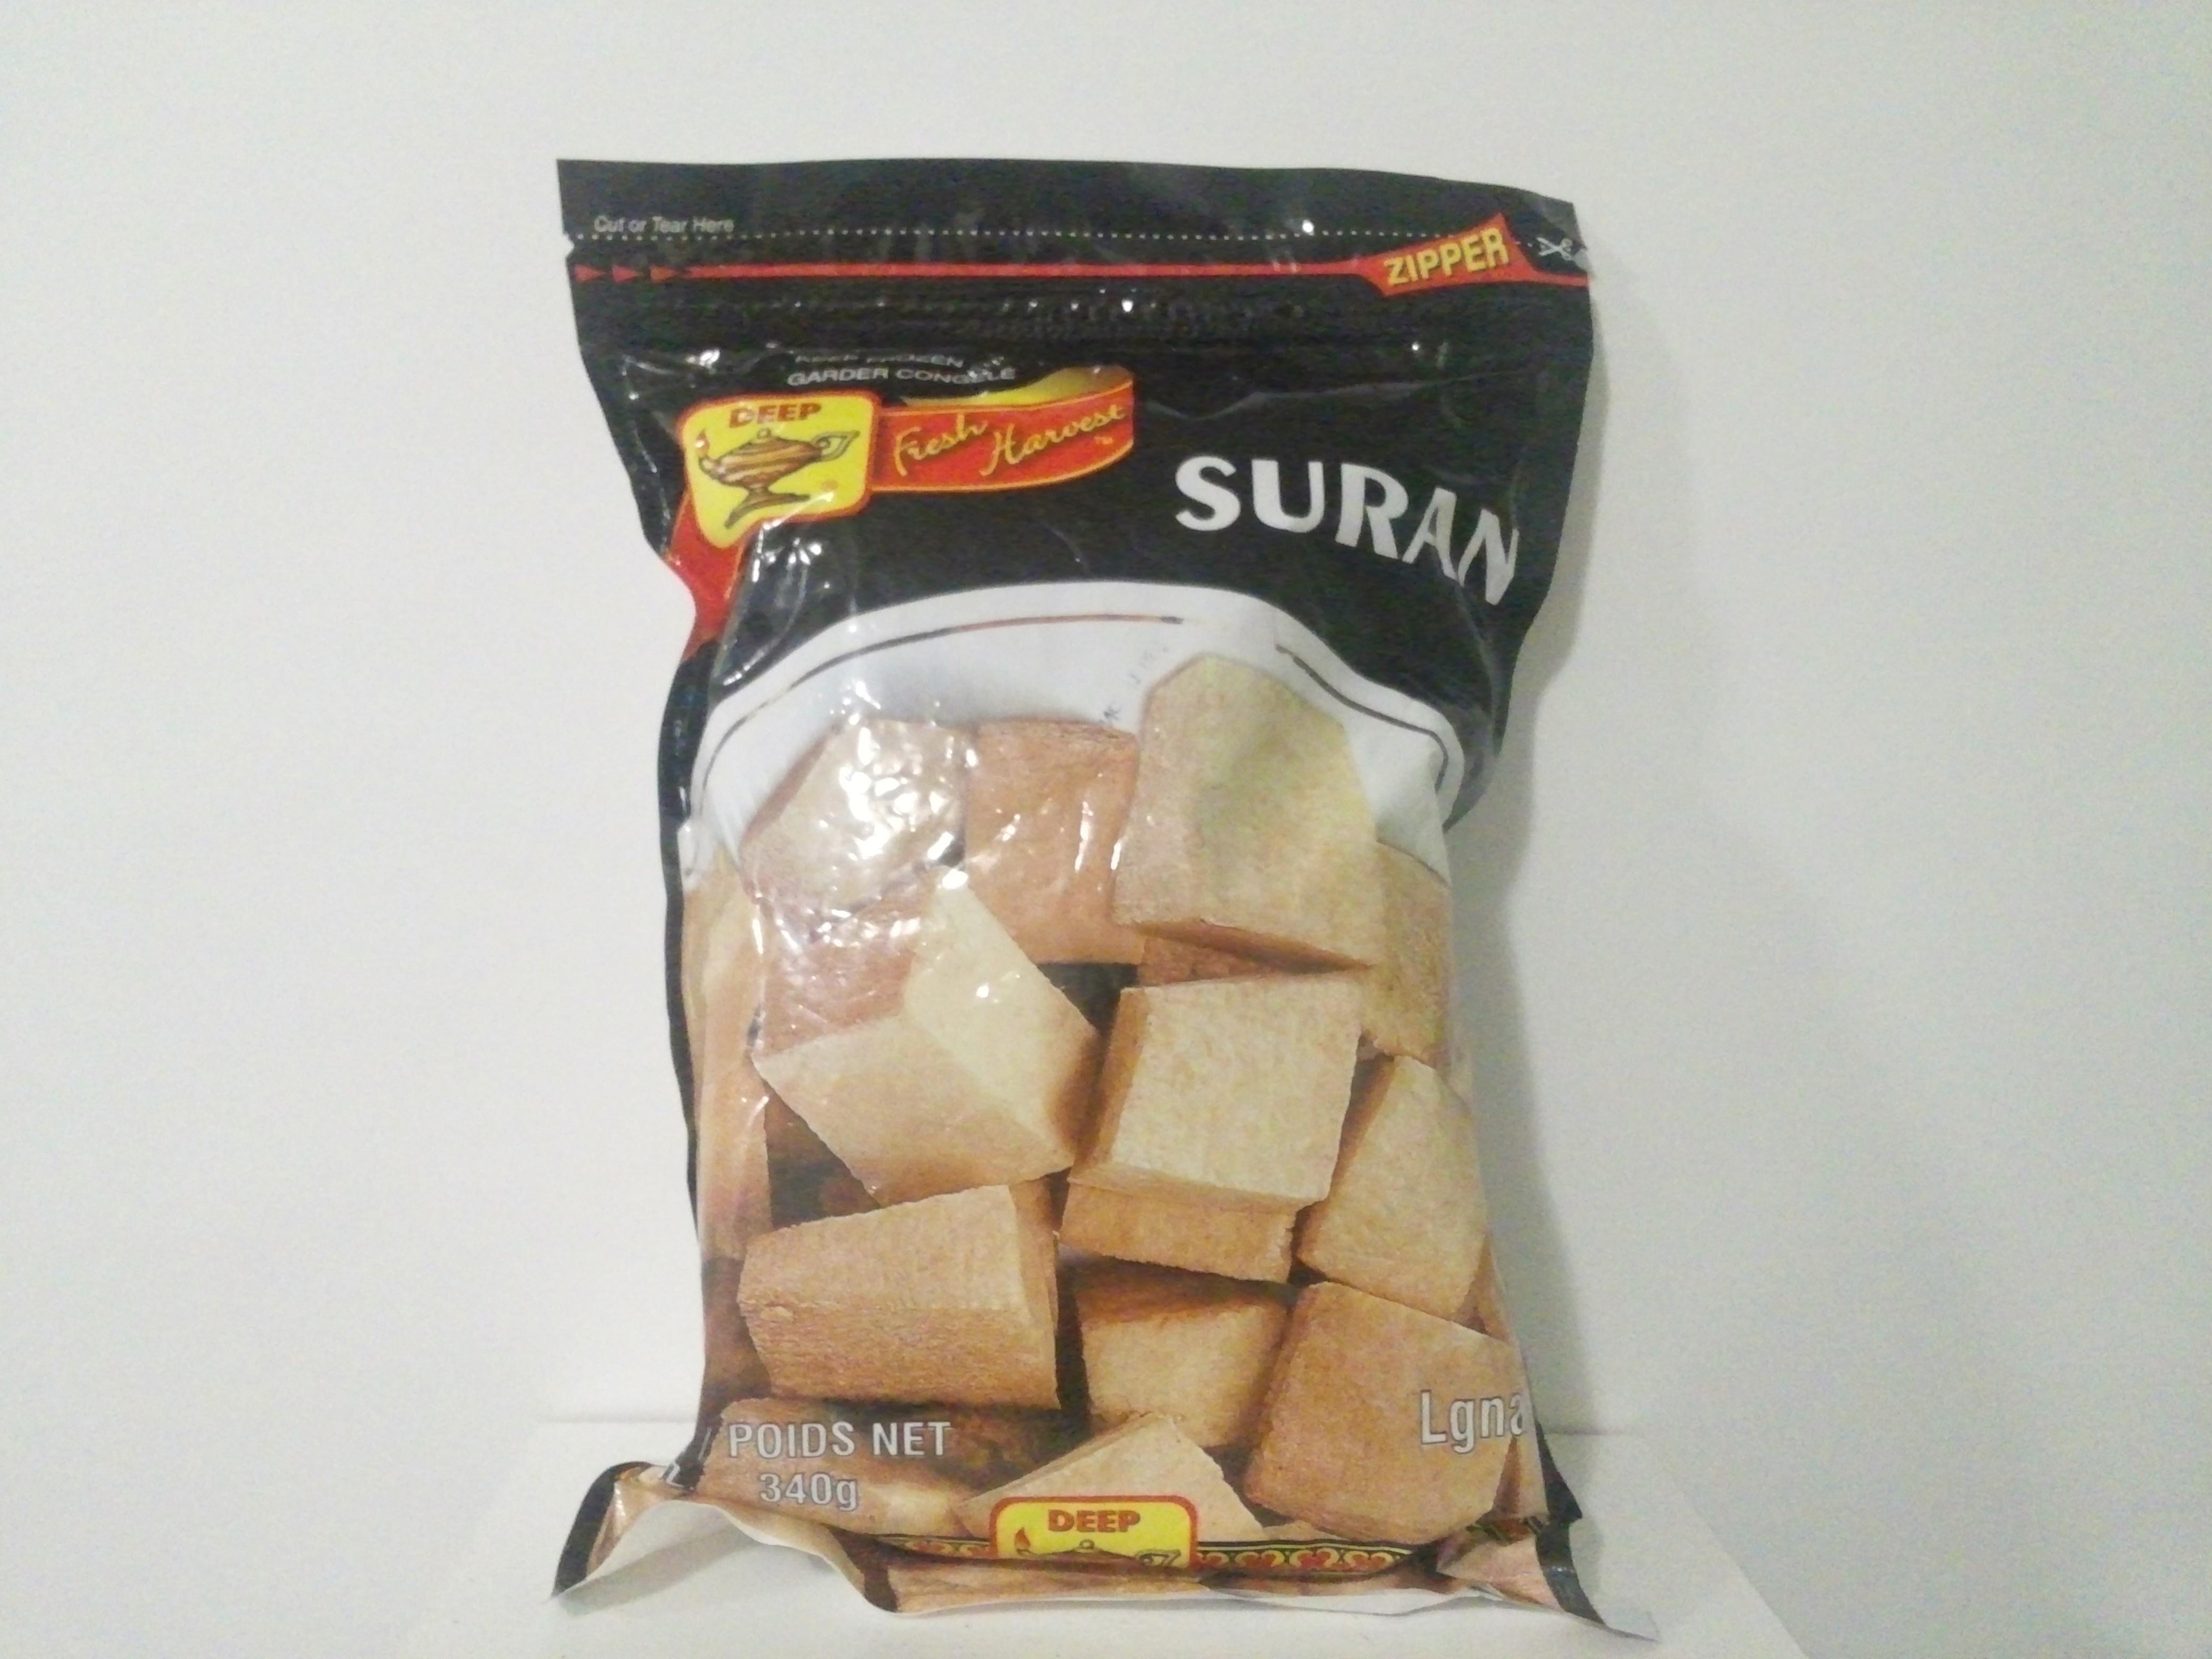 Deep Premium Suran  12 oz